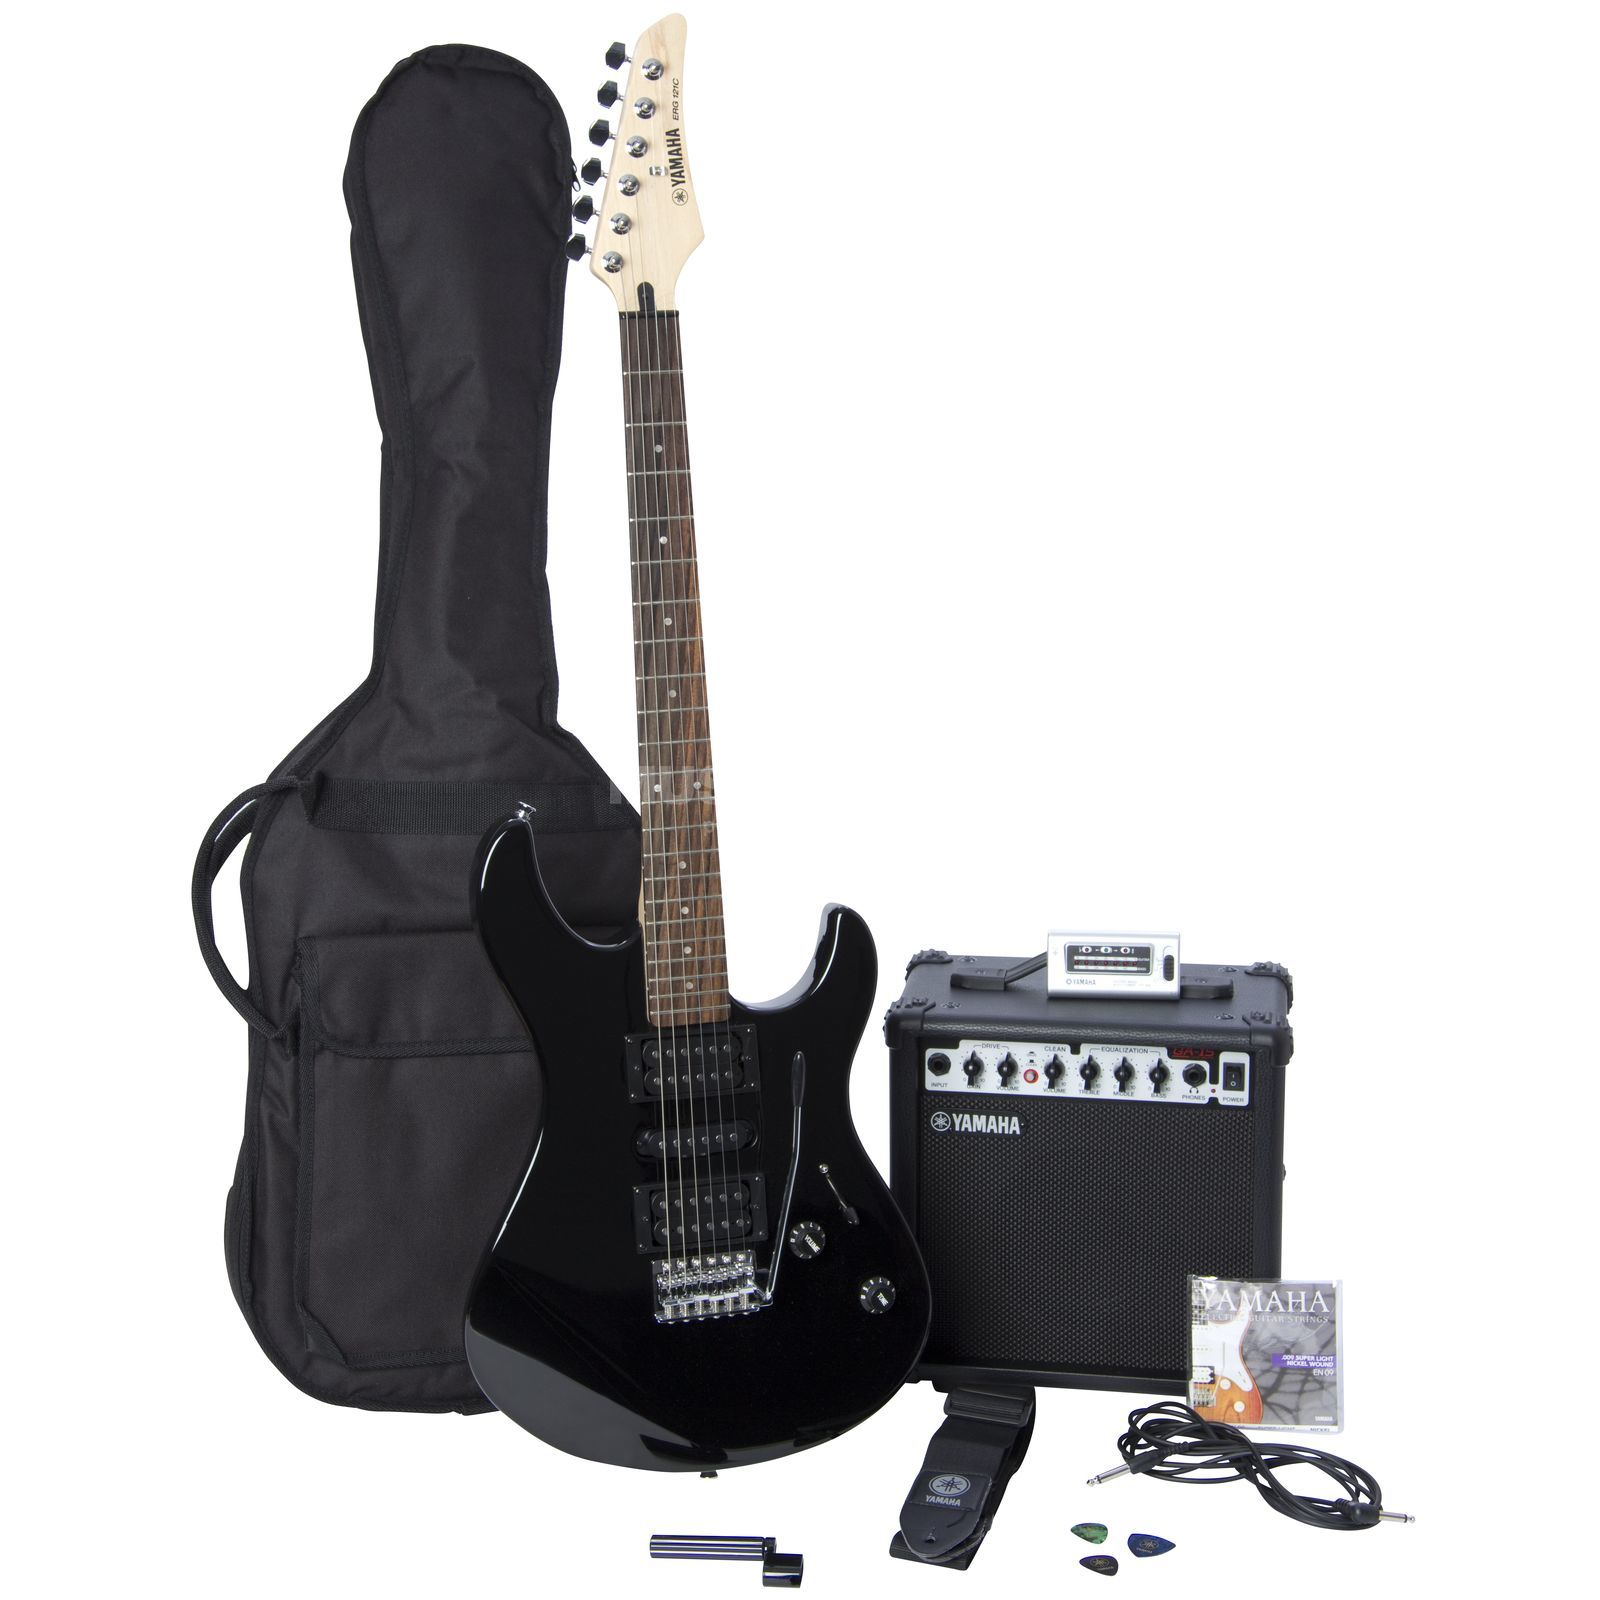 Yamaha Gigmaker Cpack